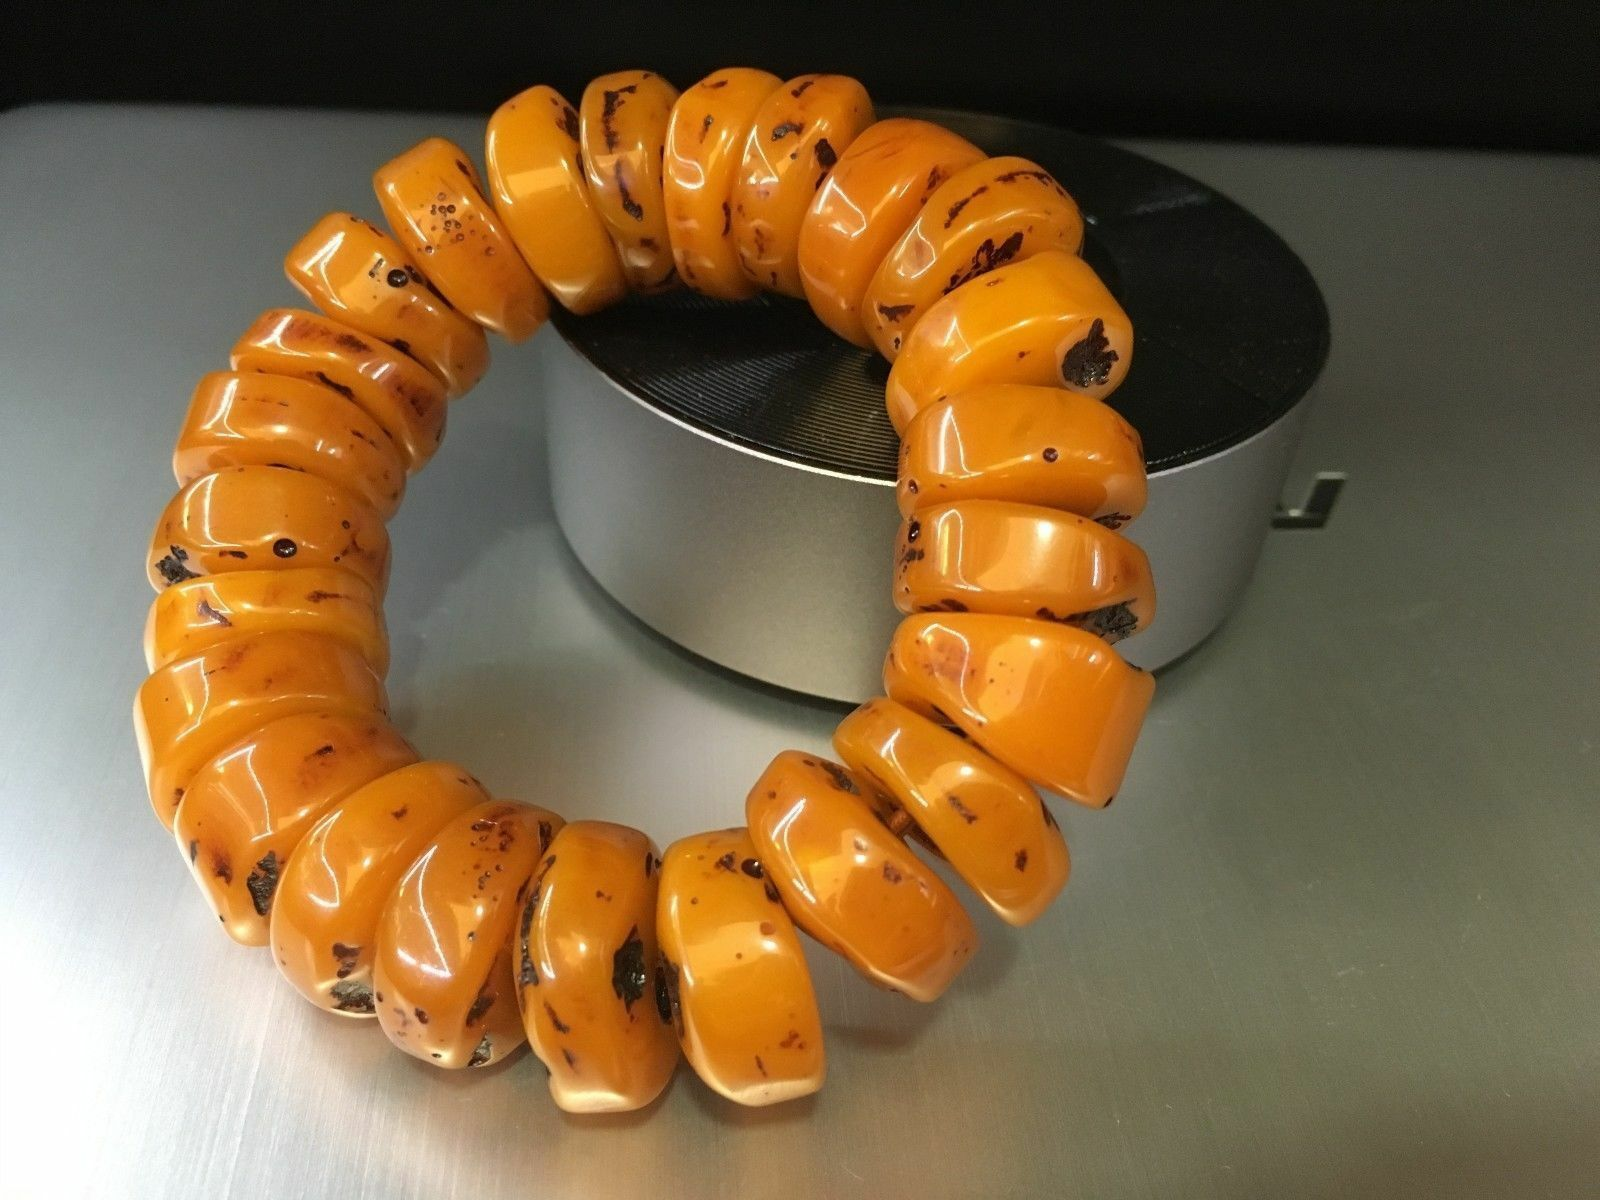 tibet mila bracelet mala prayer bead amber resin necklace baltic sea